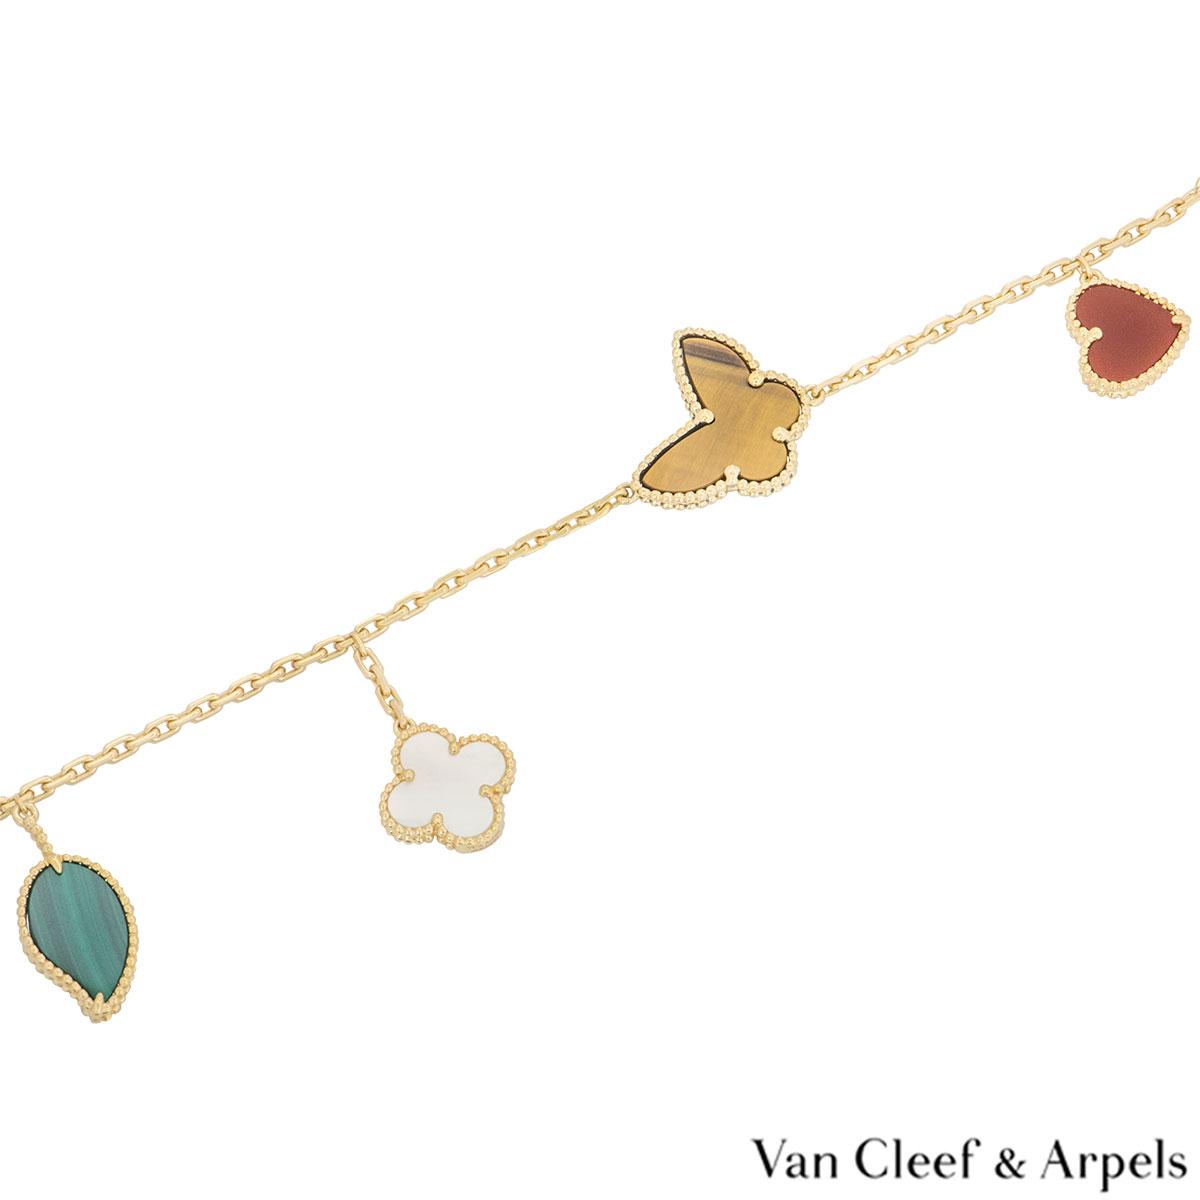 Van Cleef & Arpels Yellow Gold Lucky Alhambra Bracelet ARD79600